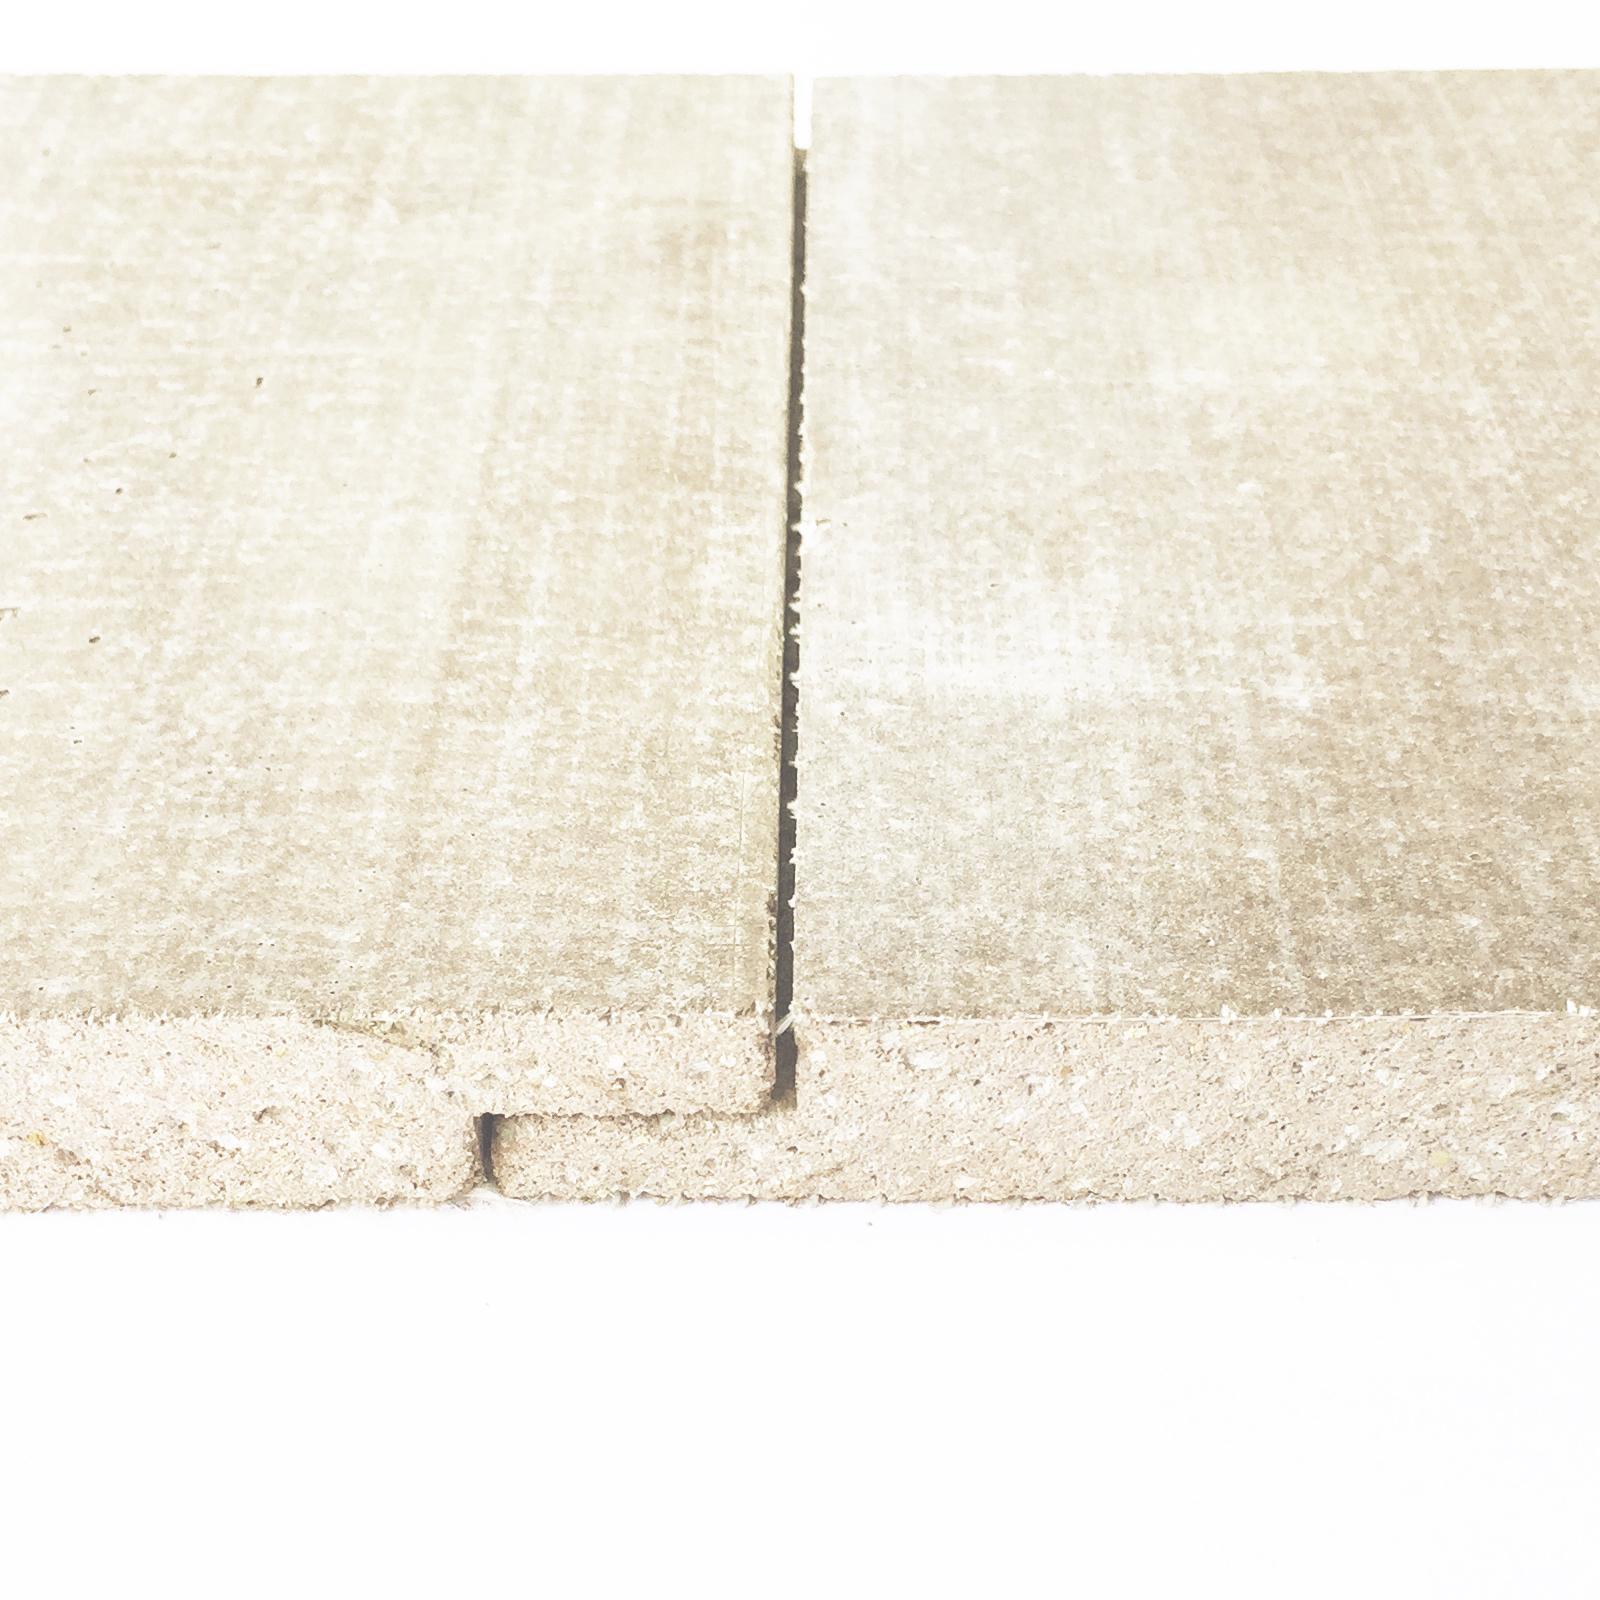 Maglok Dragon 1800 x 1200 x 20mm Flooring Board